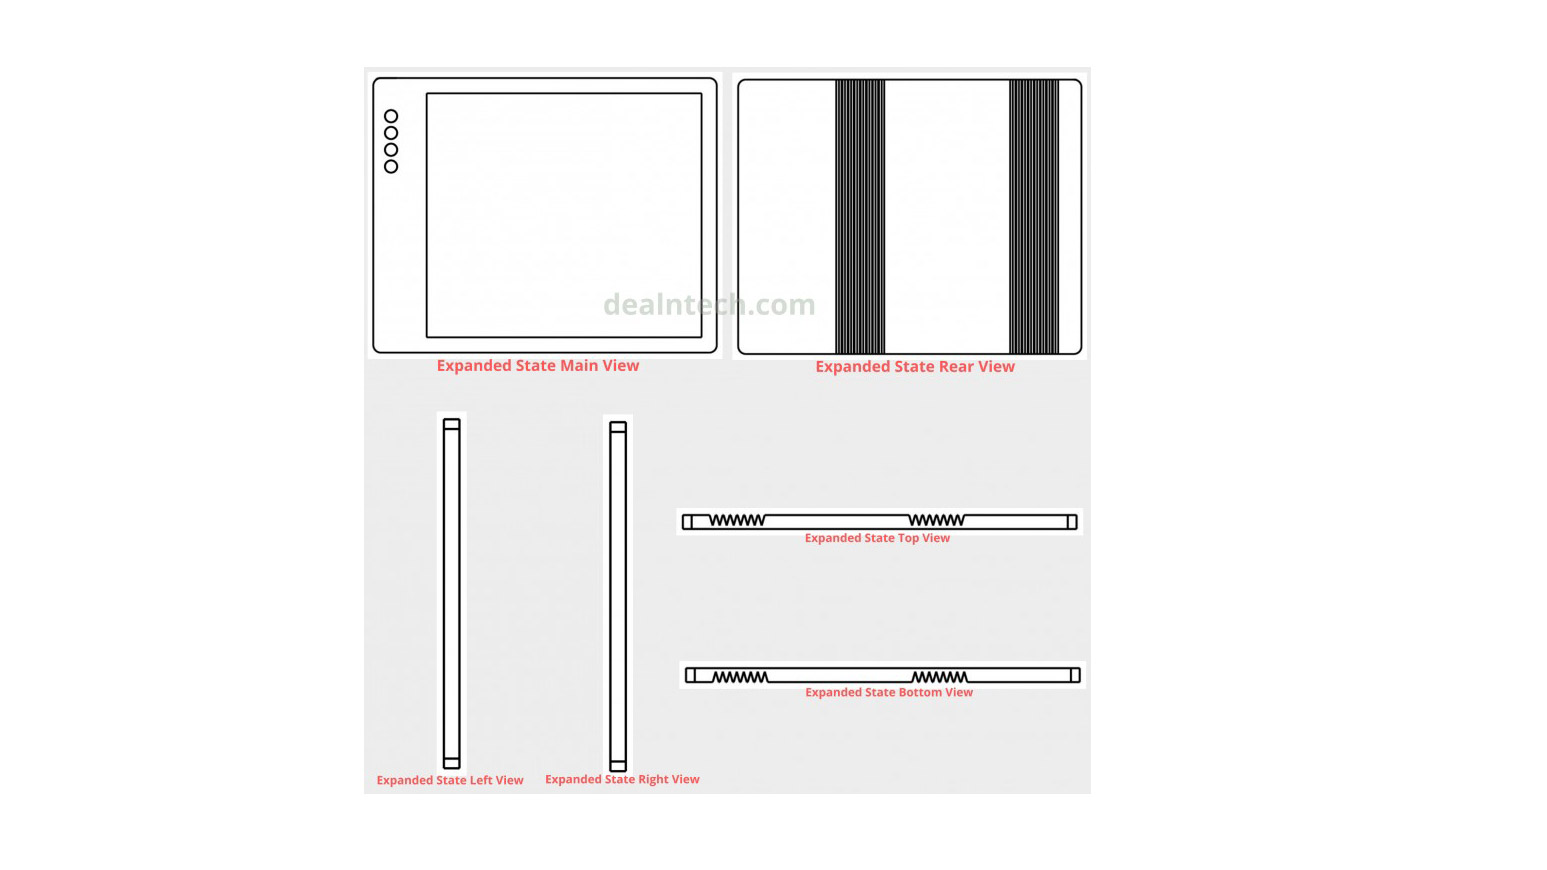 Faltbares Xiaomi-Smartphone: Neues Patent zeigt Falthandy mit Quad-Cam